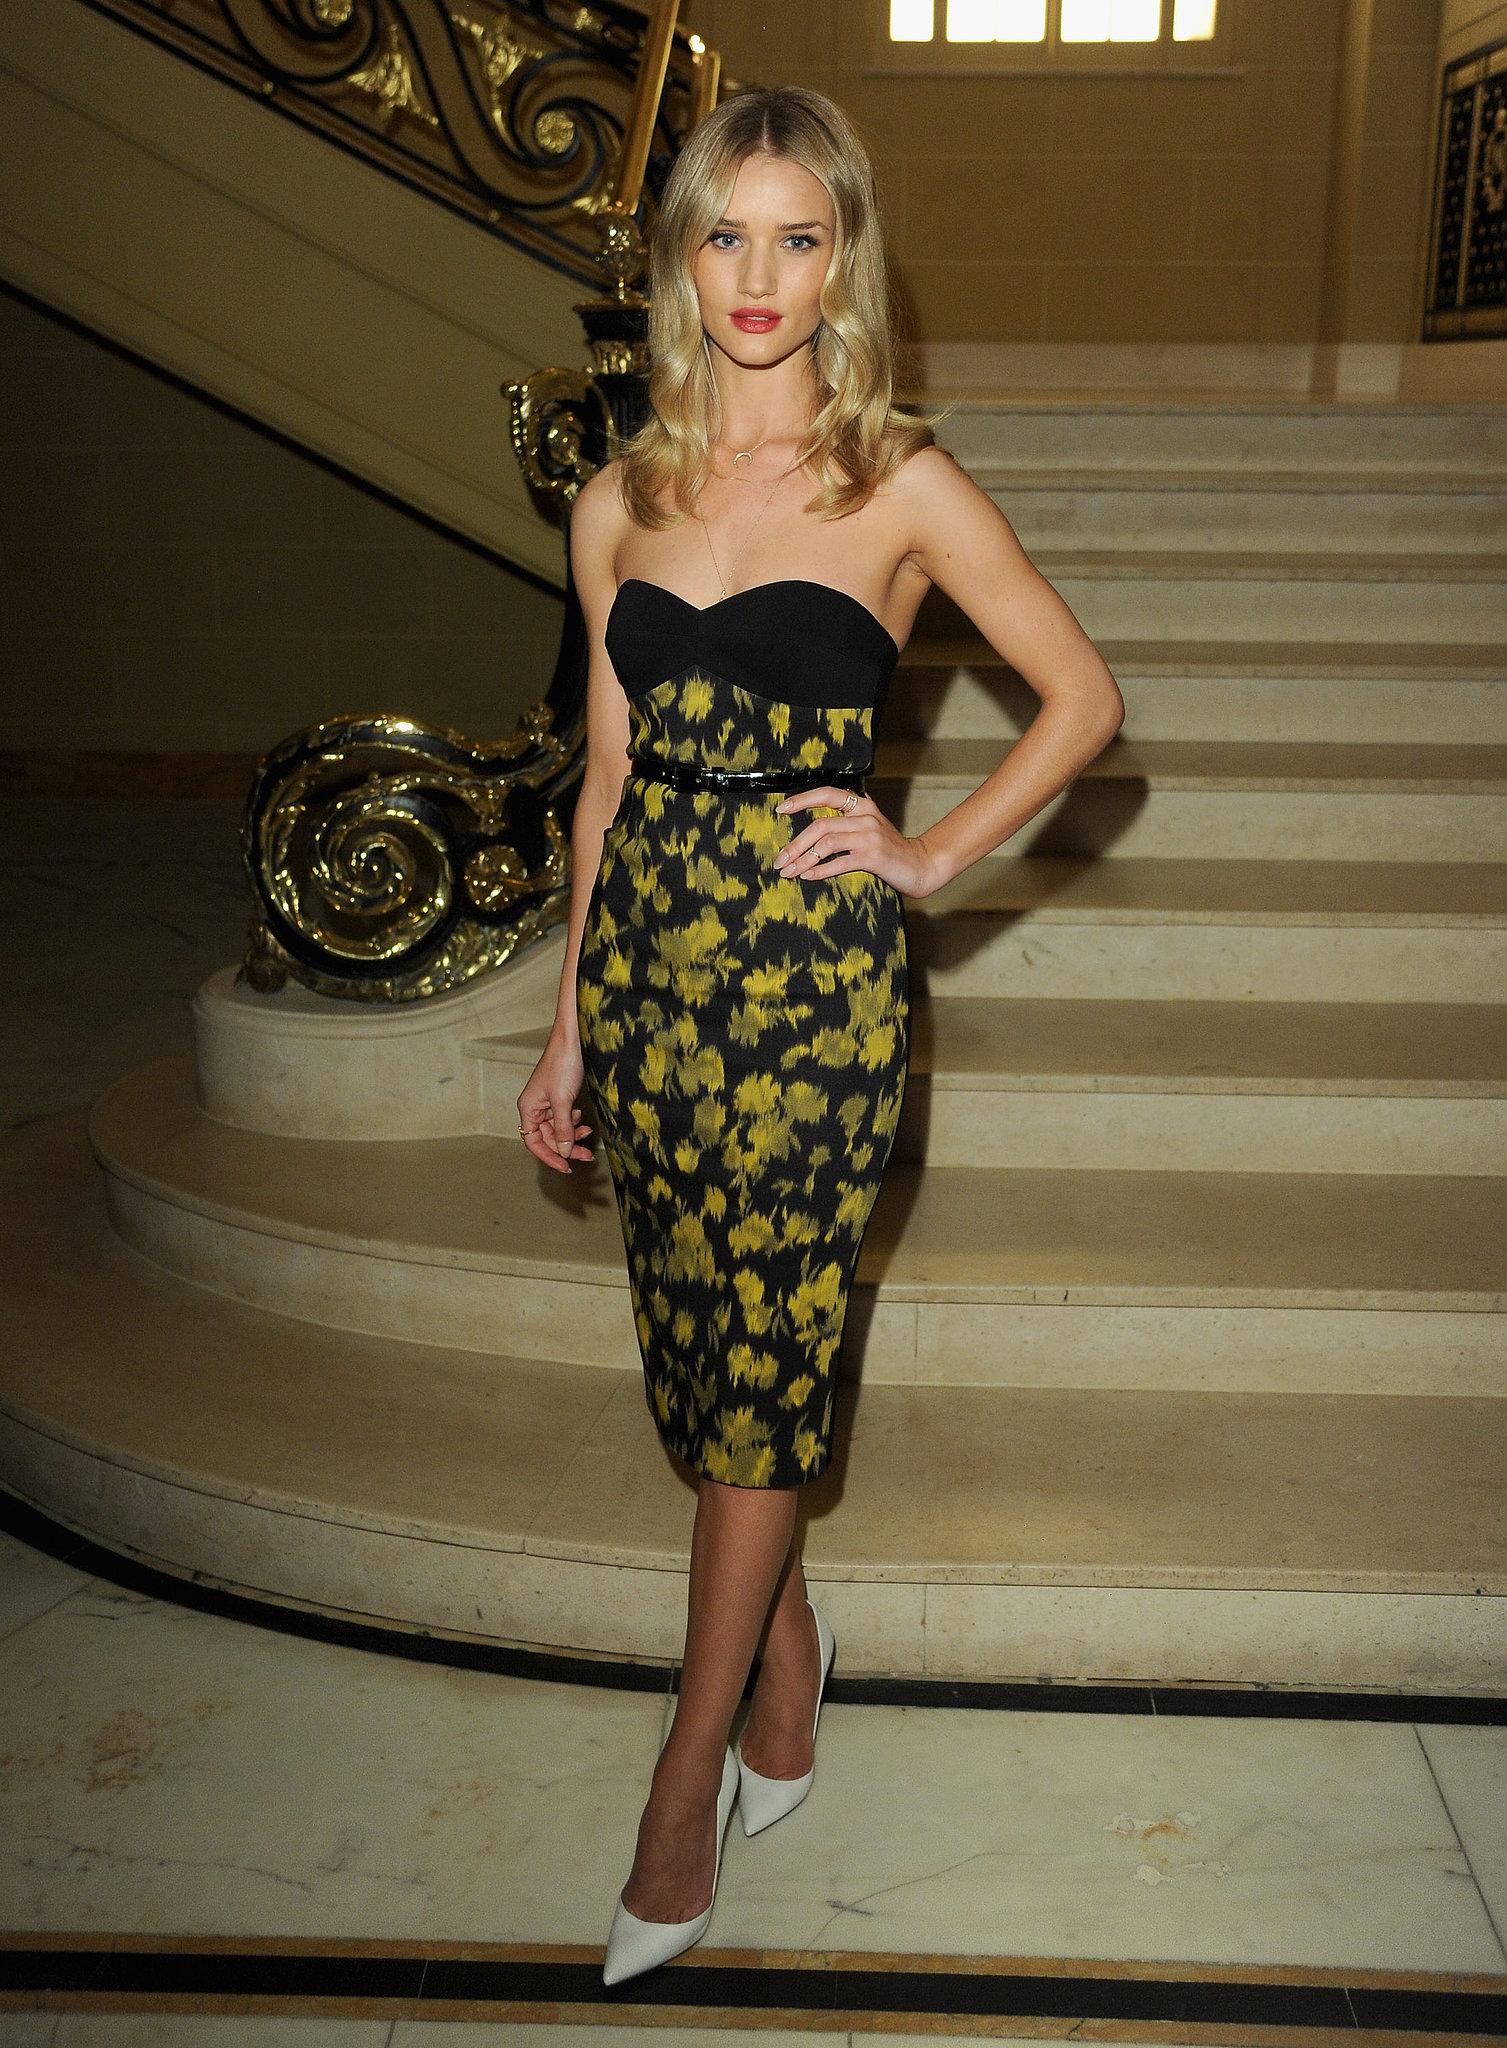 Rosie Huntington-Whiteley wore Pre-Fall 2013 Michael Kors at Vogue and Alexandra Shulman's dinner honoring Michael Kors in London.